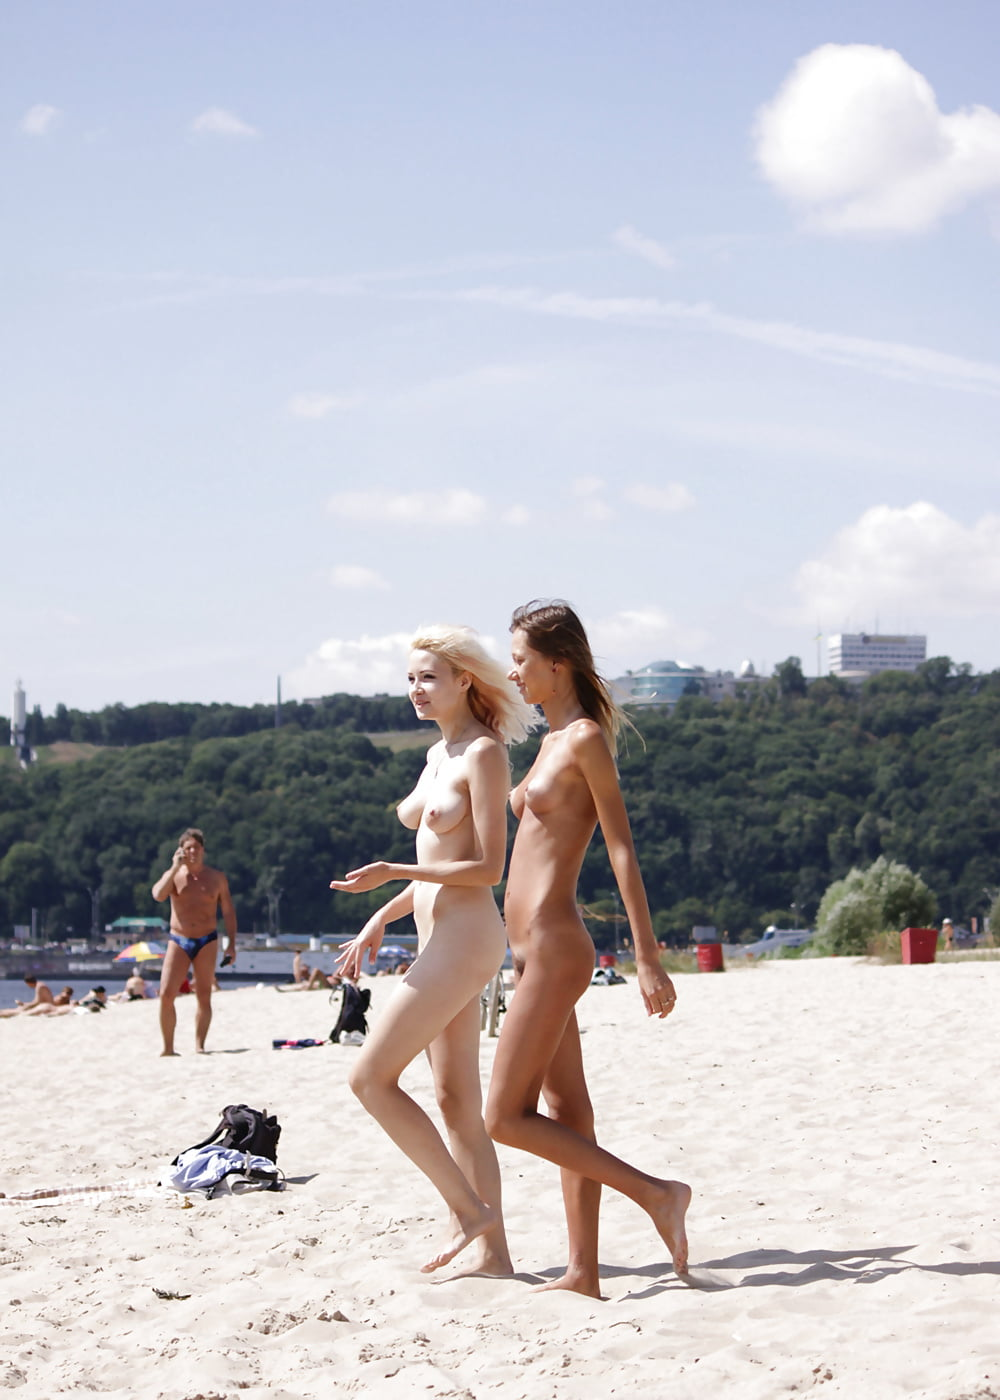 Nude Volleyball - 53 Pics - Xhamstercom-1847